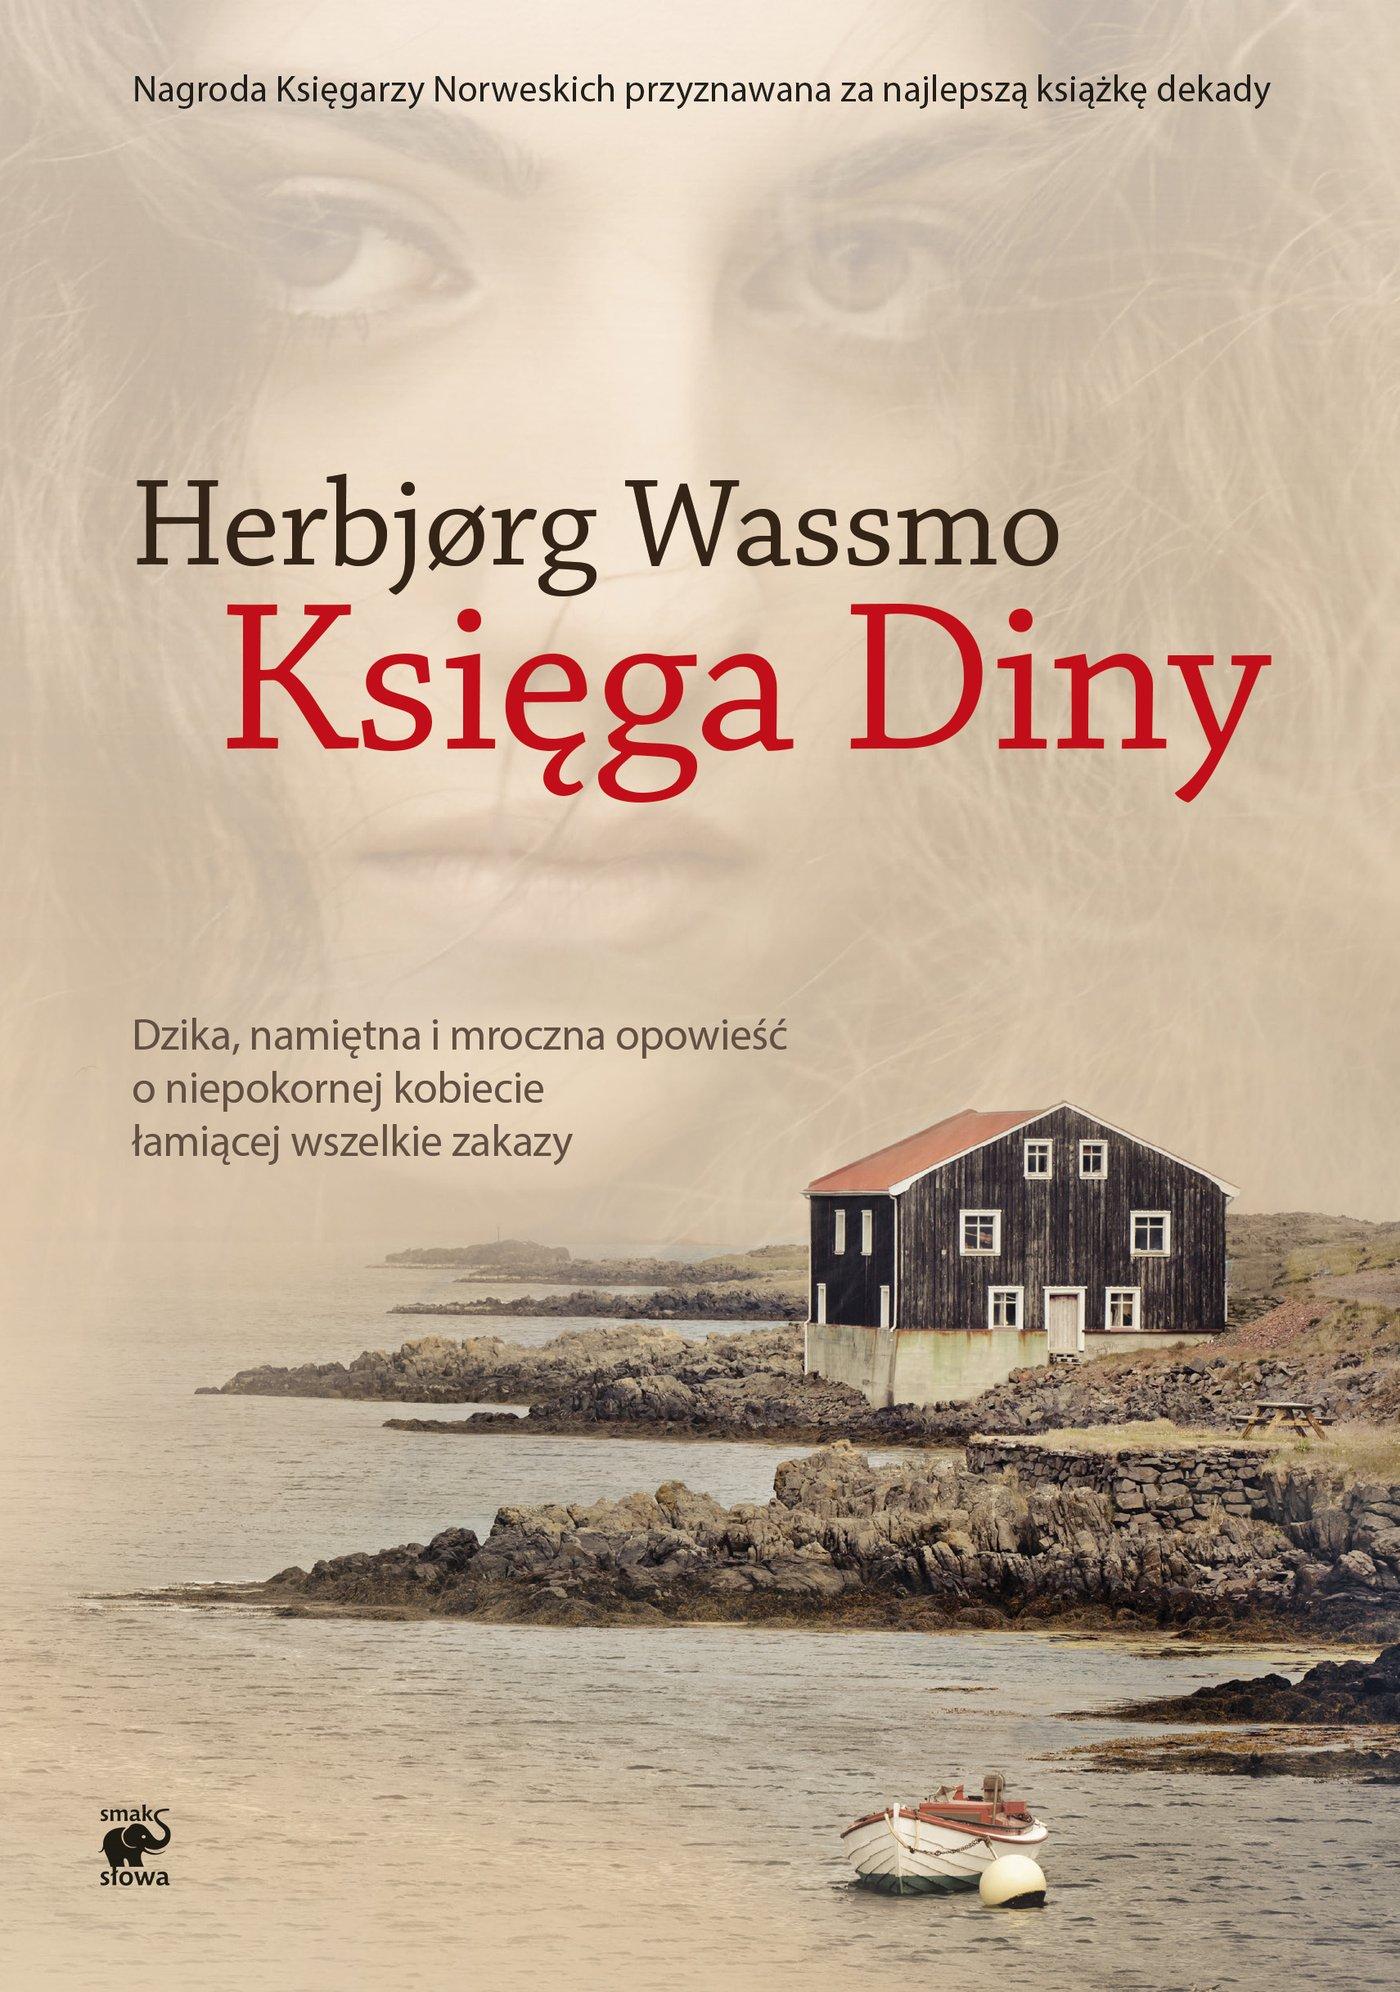 Księga Diny - Ebook (Książka na Kindle) do pobrania w formacie MOBI